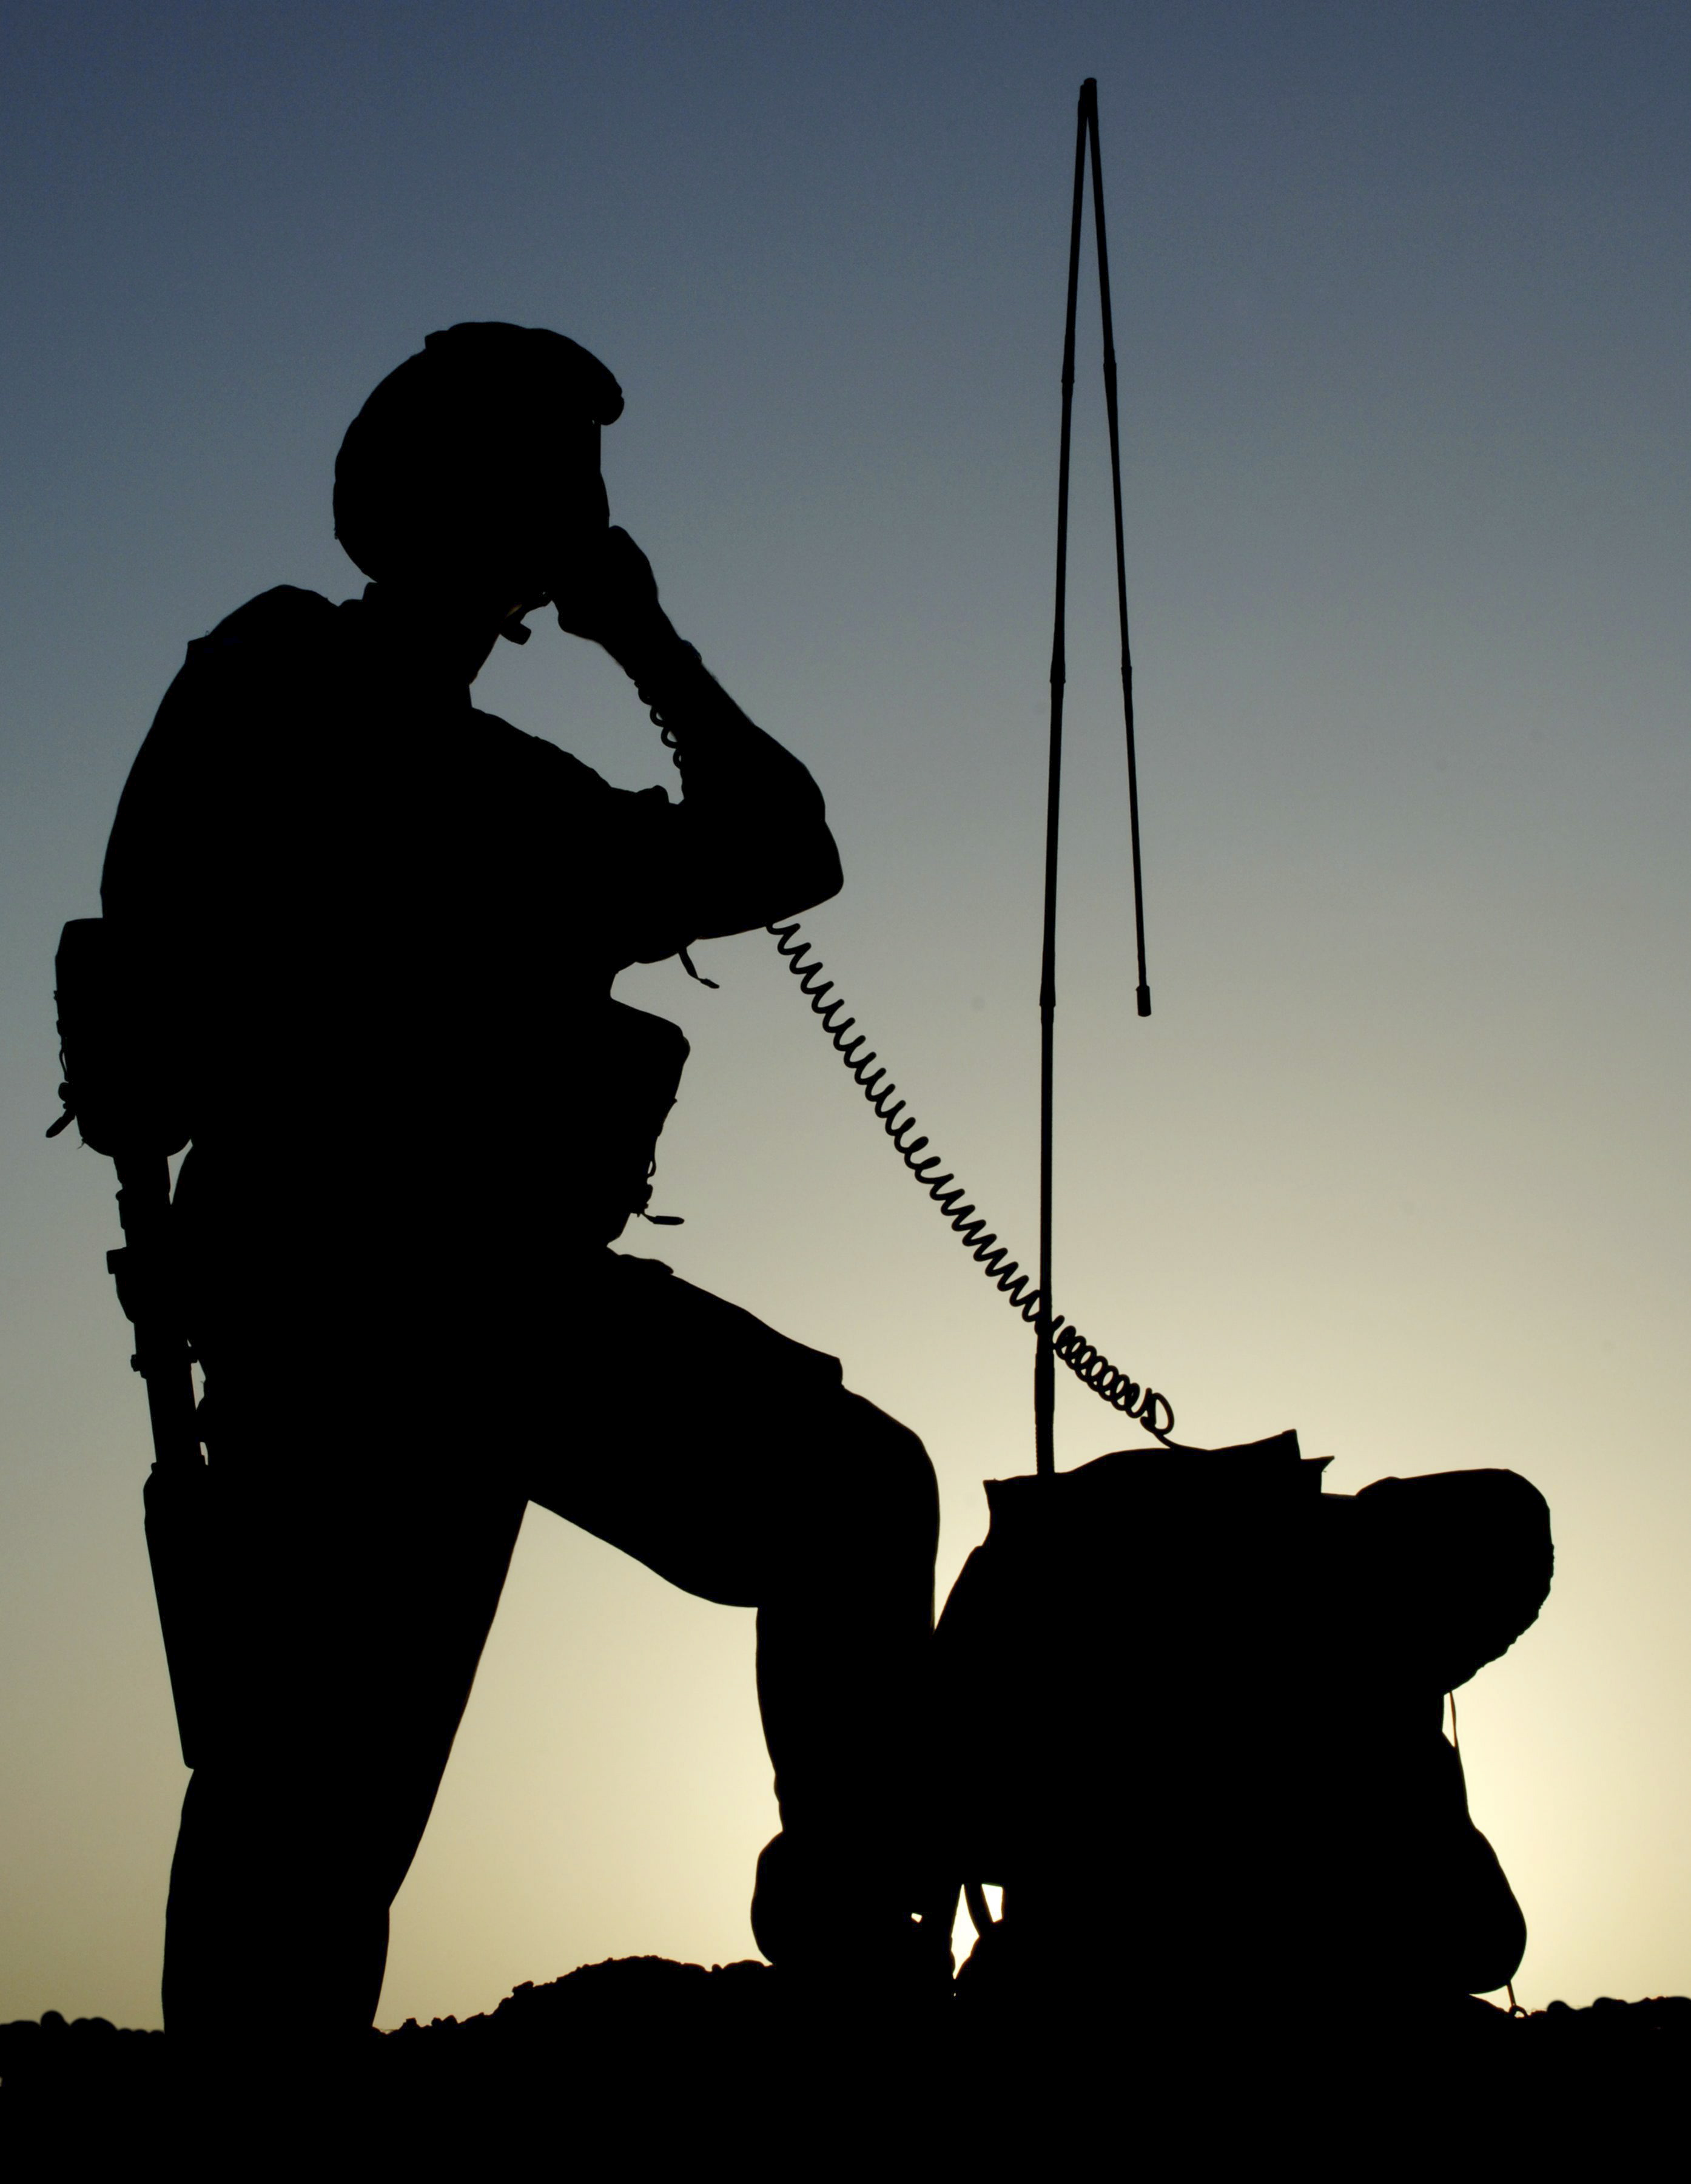 File:A member of 216 Sigs Sqn operates Bowman 325 HF man pack radio